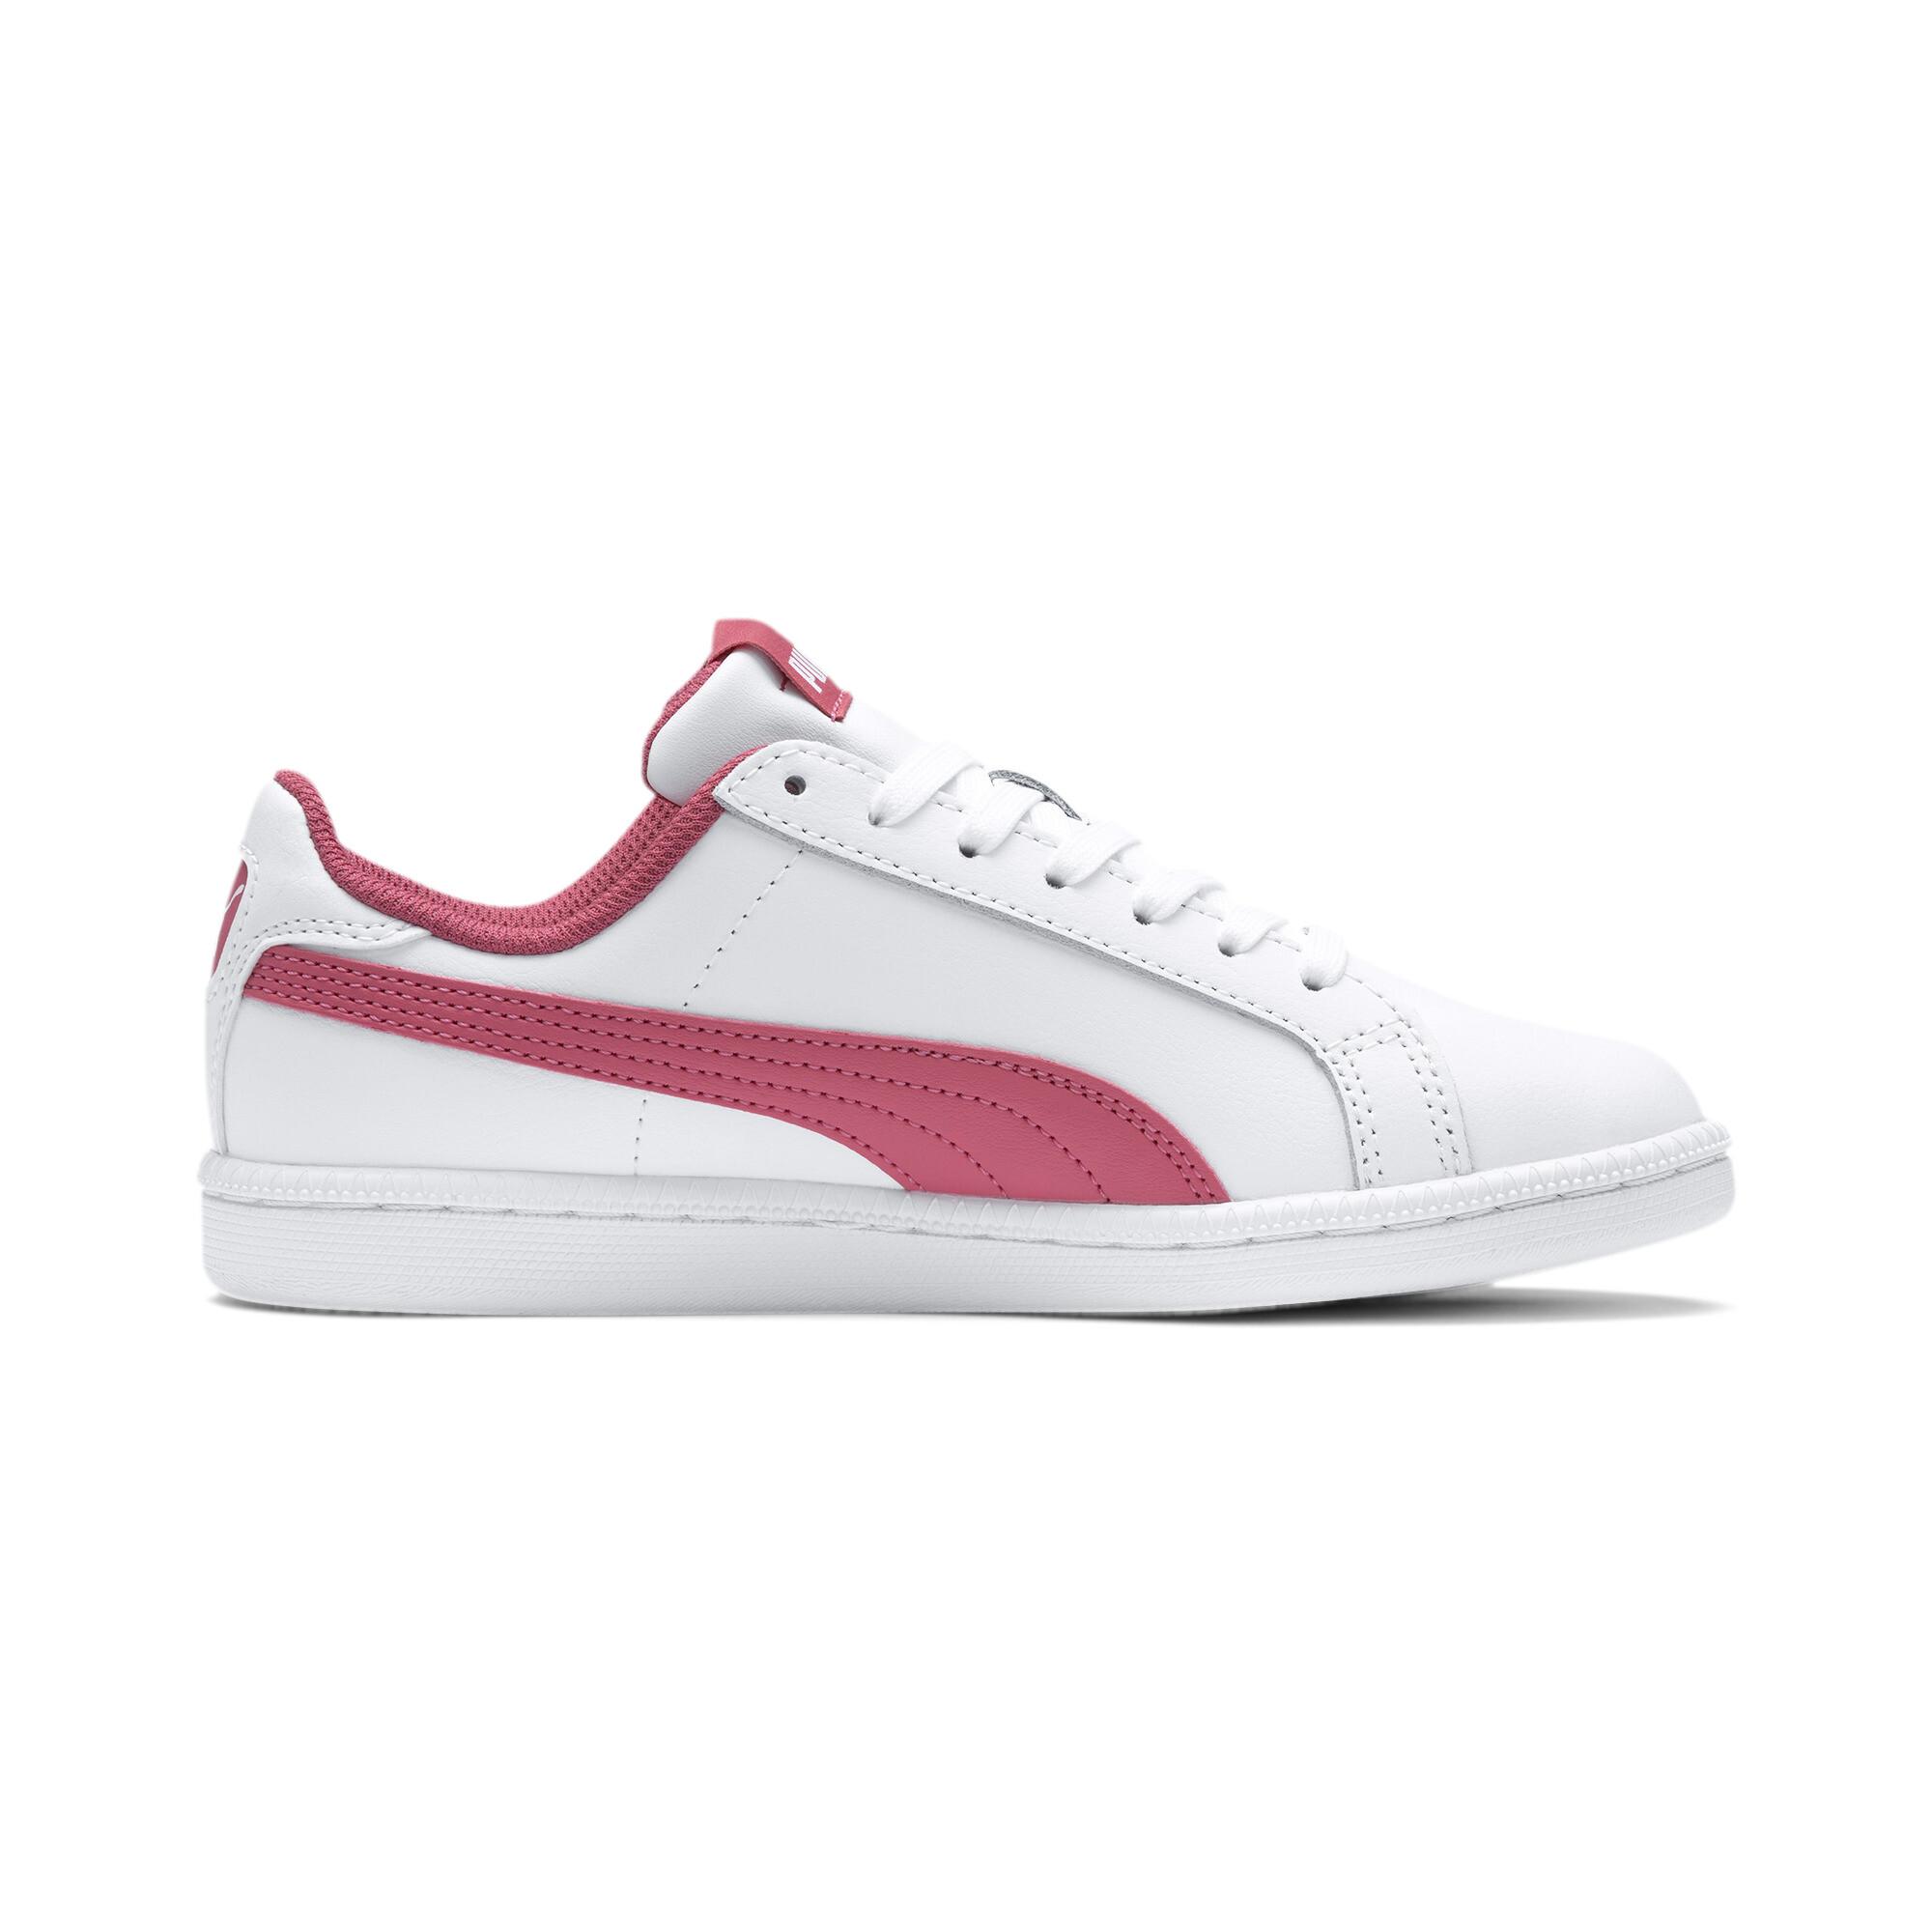 PUMA-Smash-Jr-Sneaker-Unisex-Schuhe-Kinder-Neu Indexbild 21